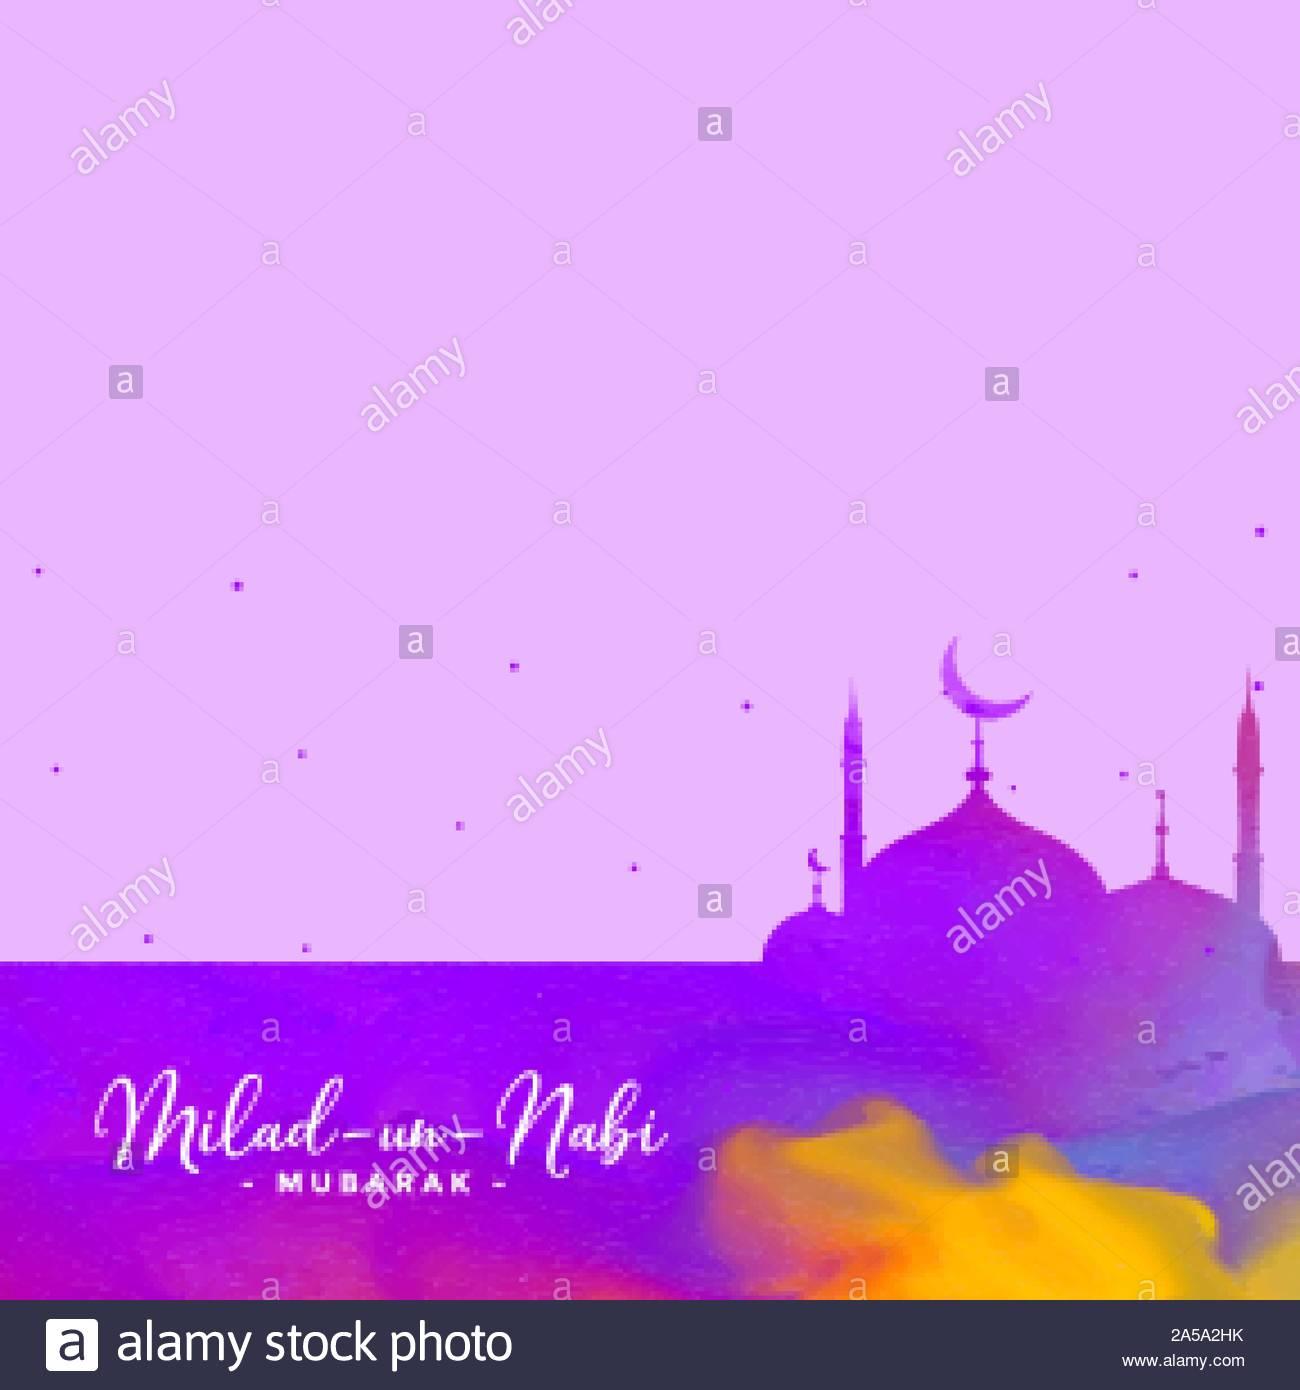 eid milad un nabi barawafat holiday background stock vector image art alamy alamy